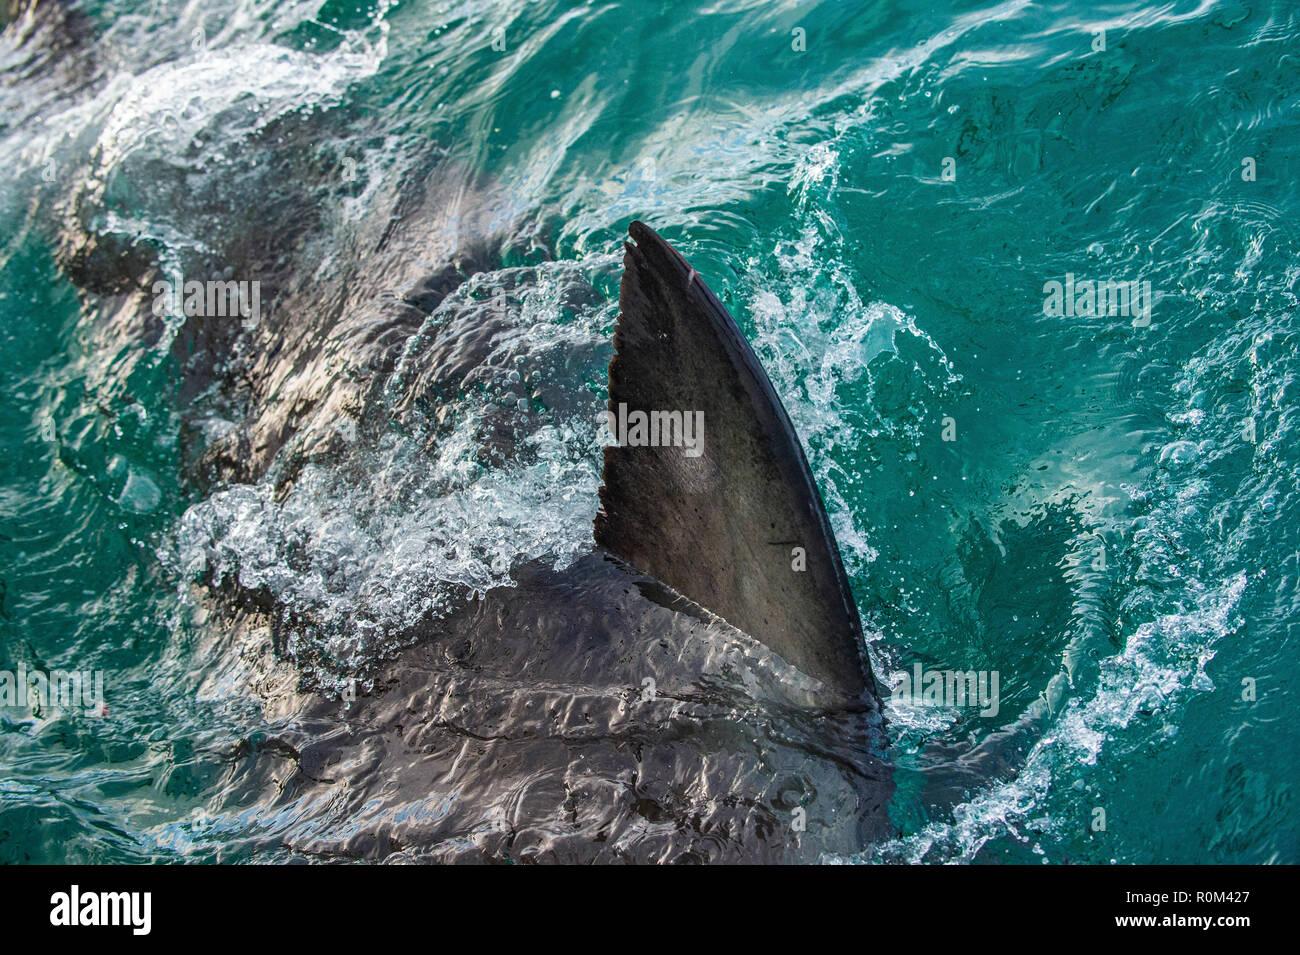 Shark Fin Above Water Stock Photos & Shark Fin Above Water